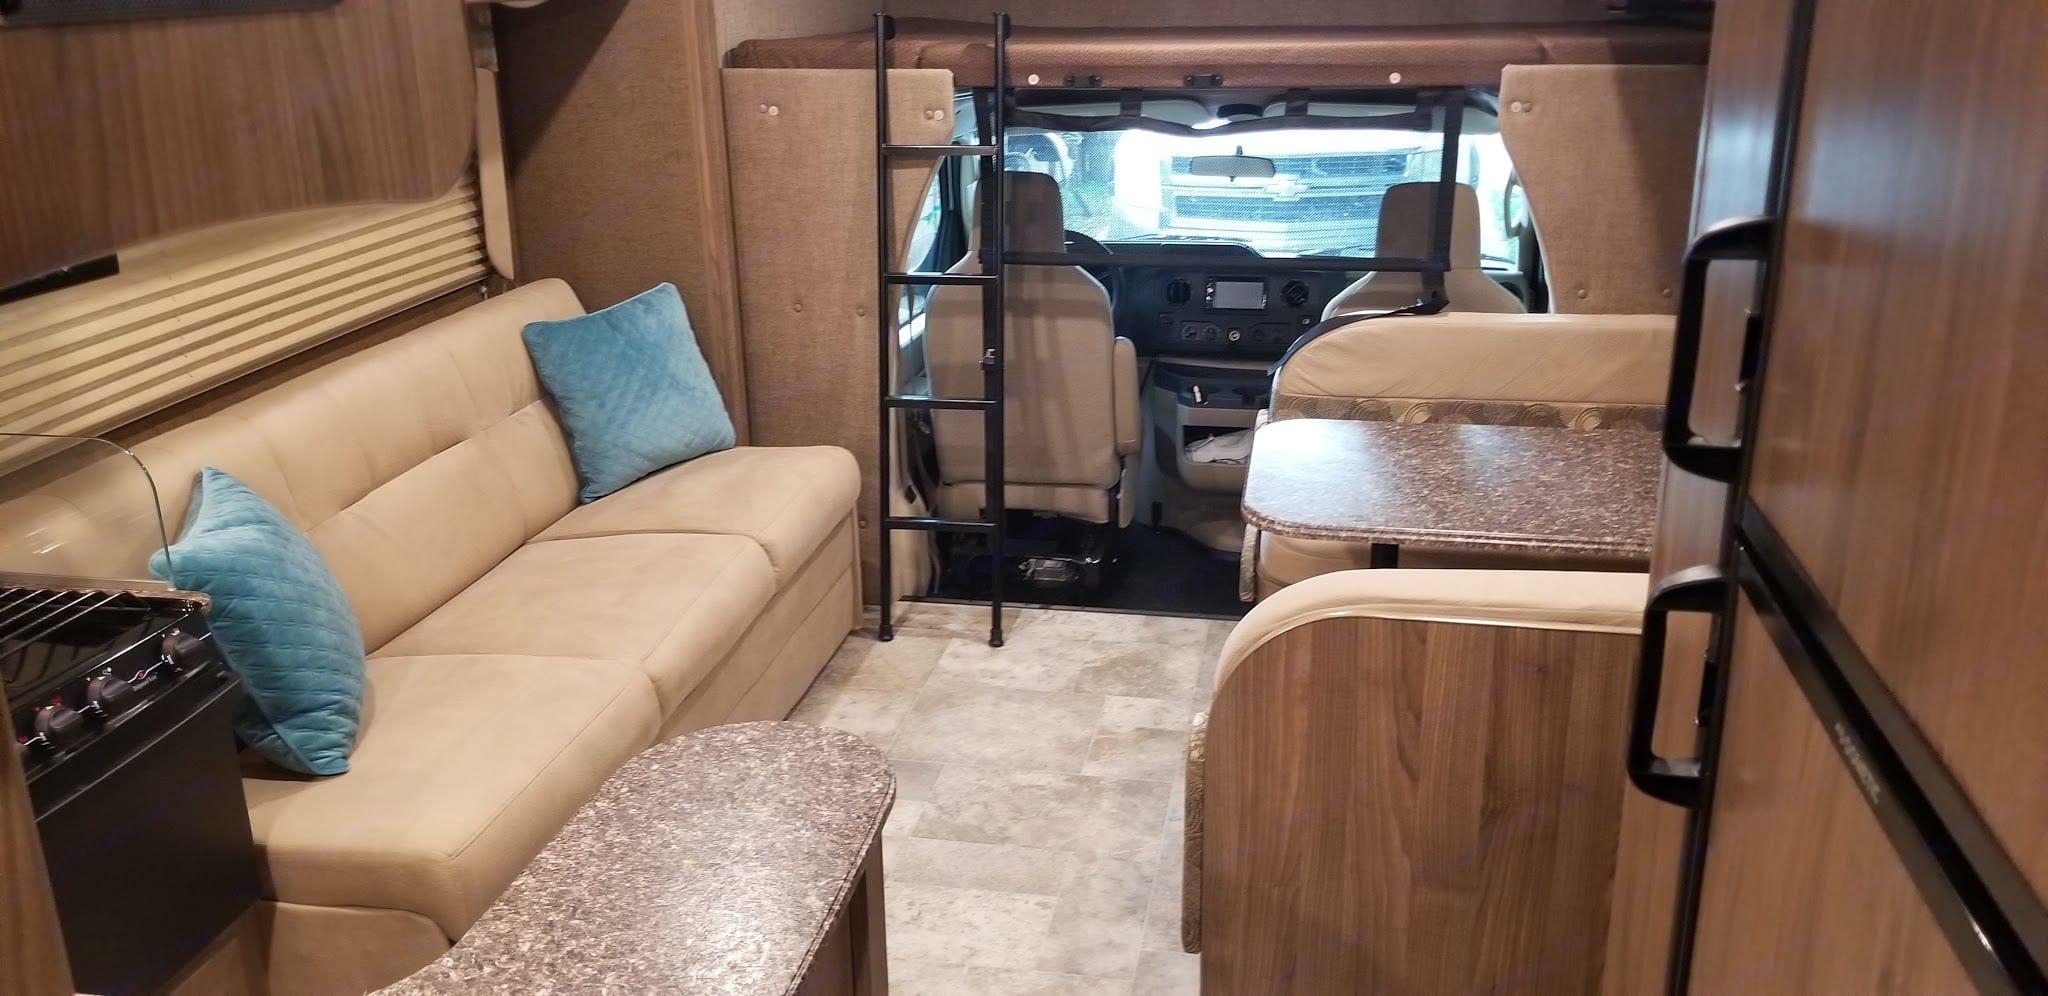 Everything brand new, and travel ready. Coachmen Freelander 2018